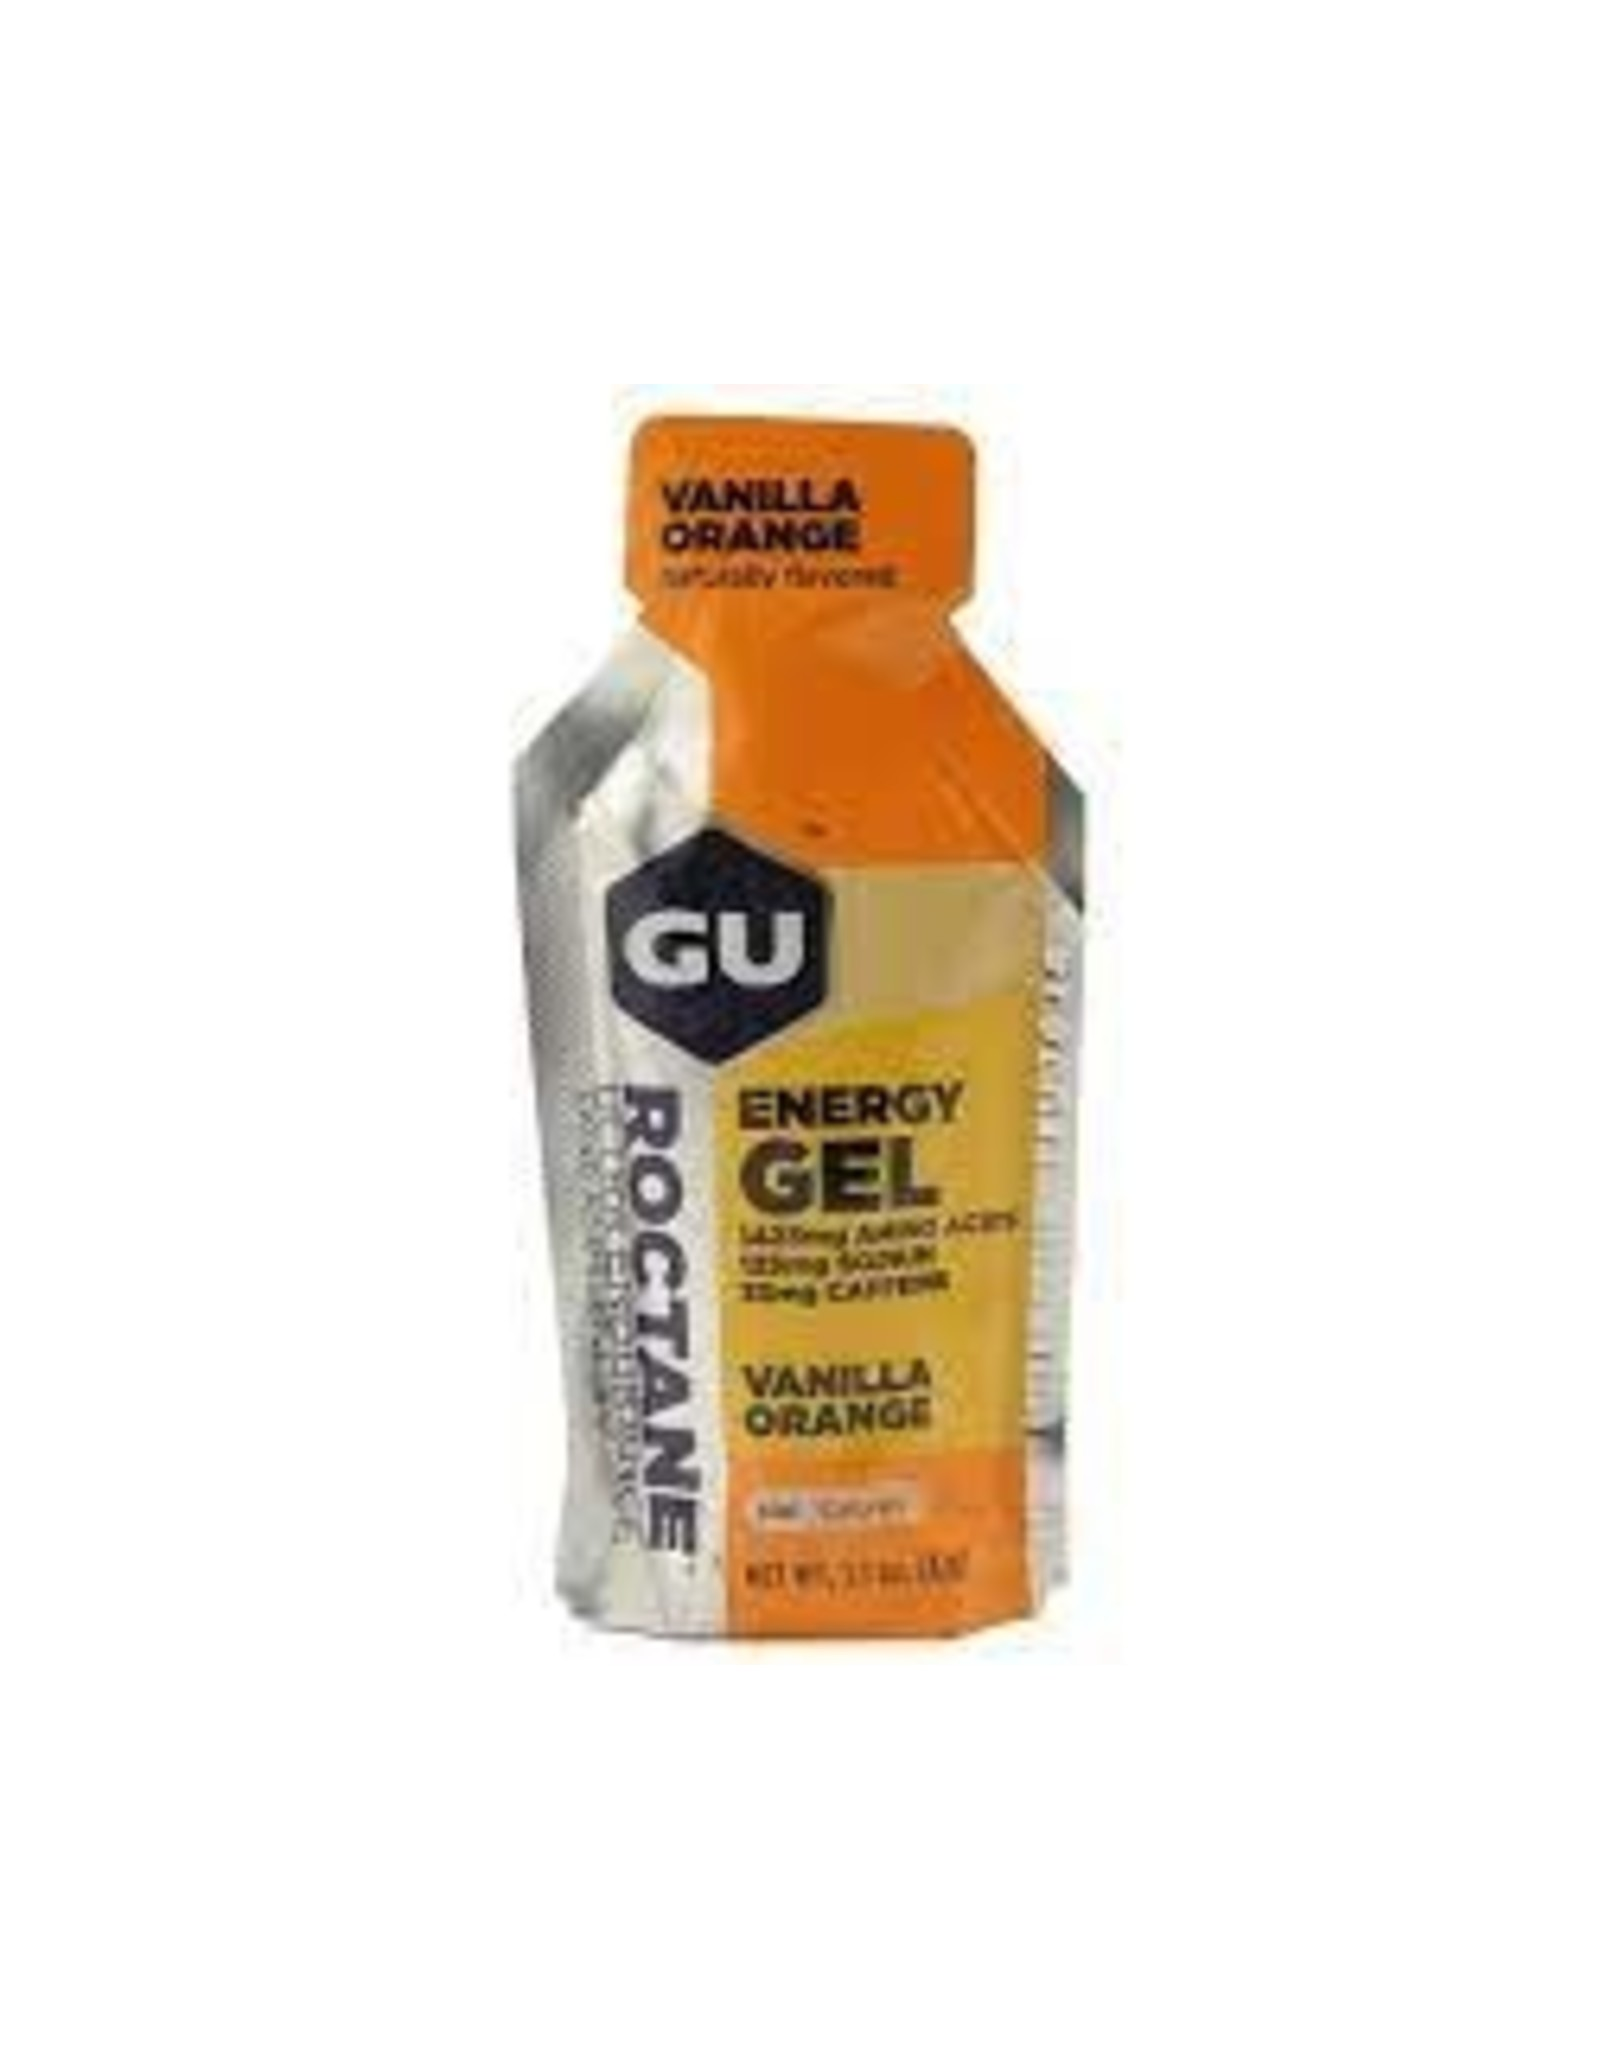 GU Energy Labs GU Roctane Vanilla Orange Box of 24 single